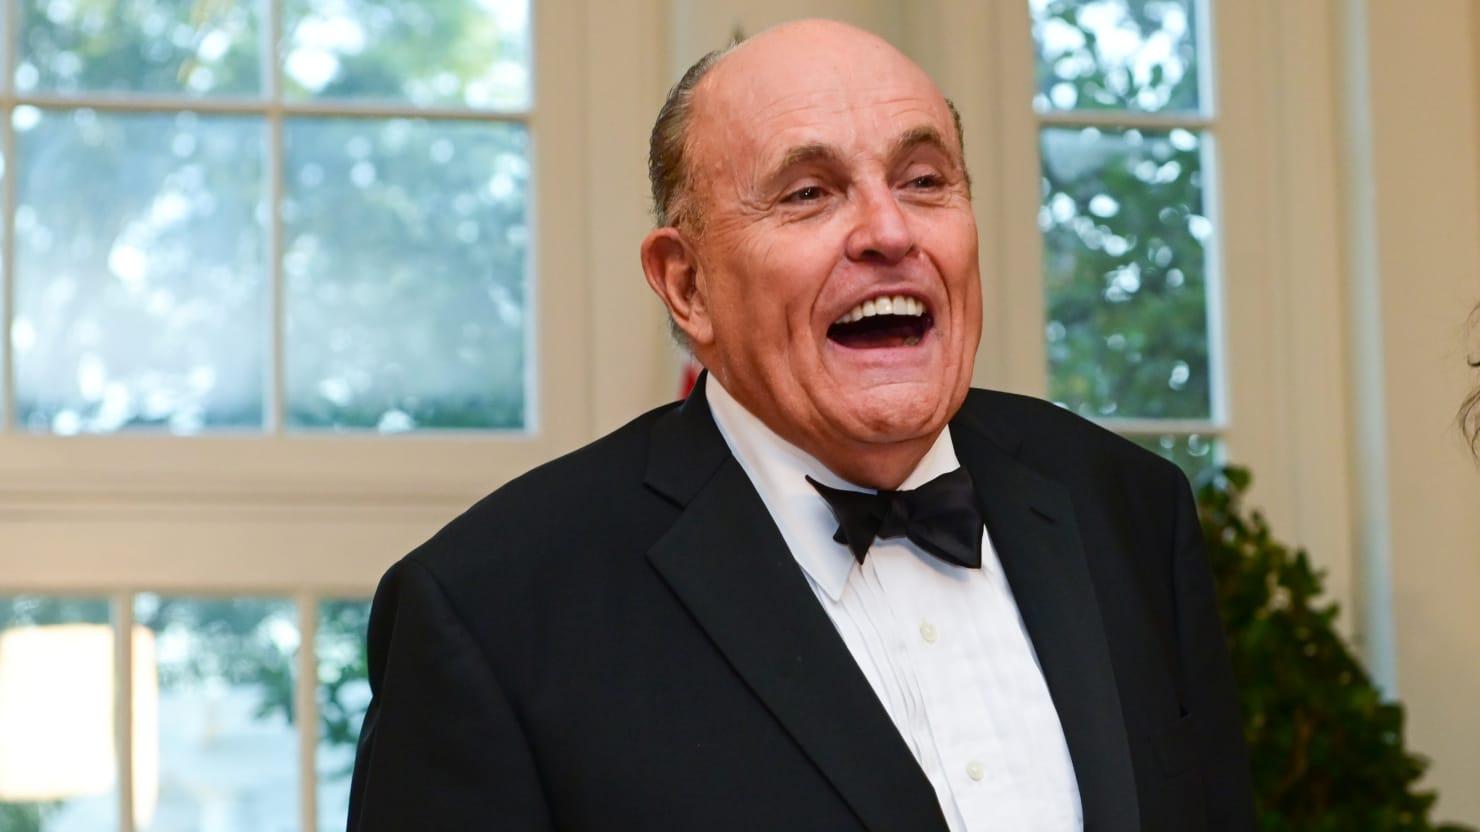 House Subpoenas Rudy Giuliani for Documents About Trump and Ukraine